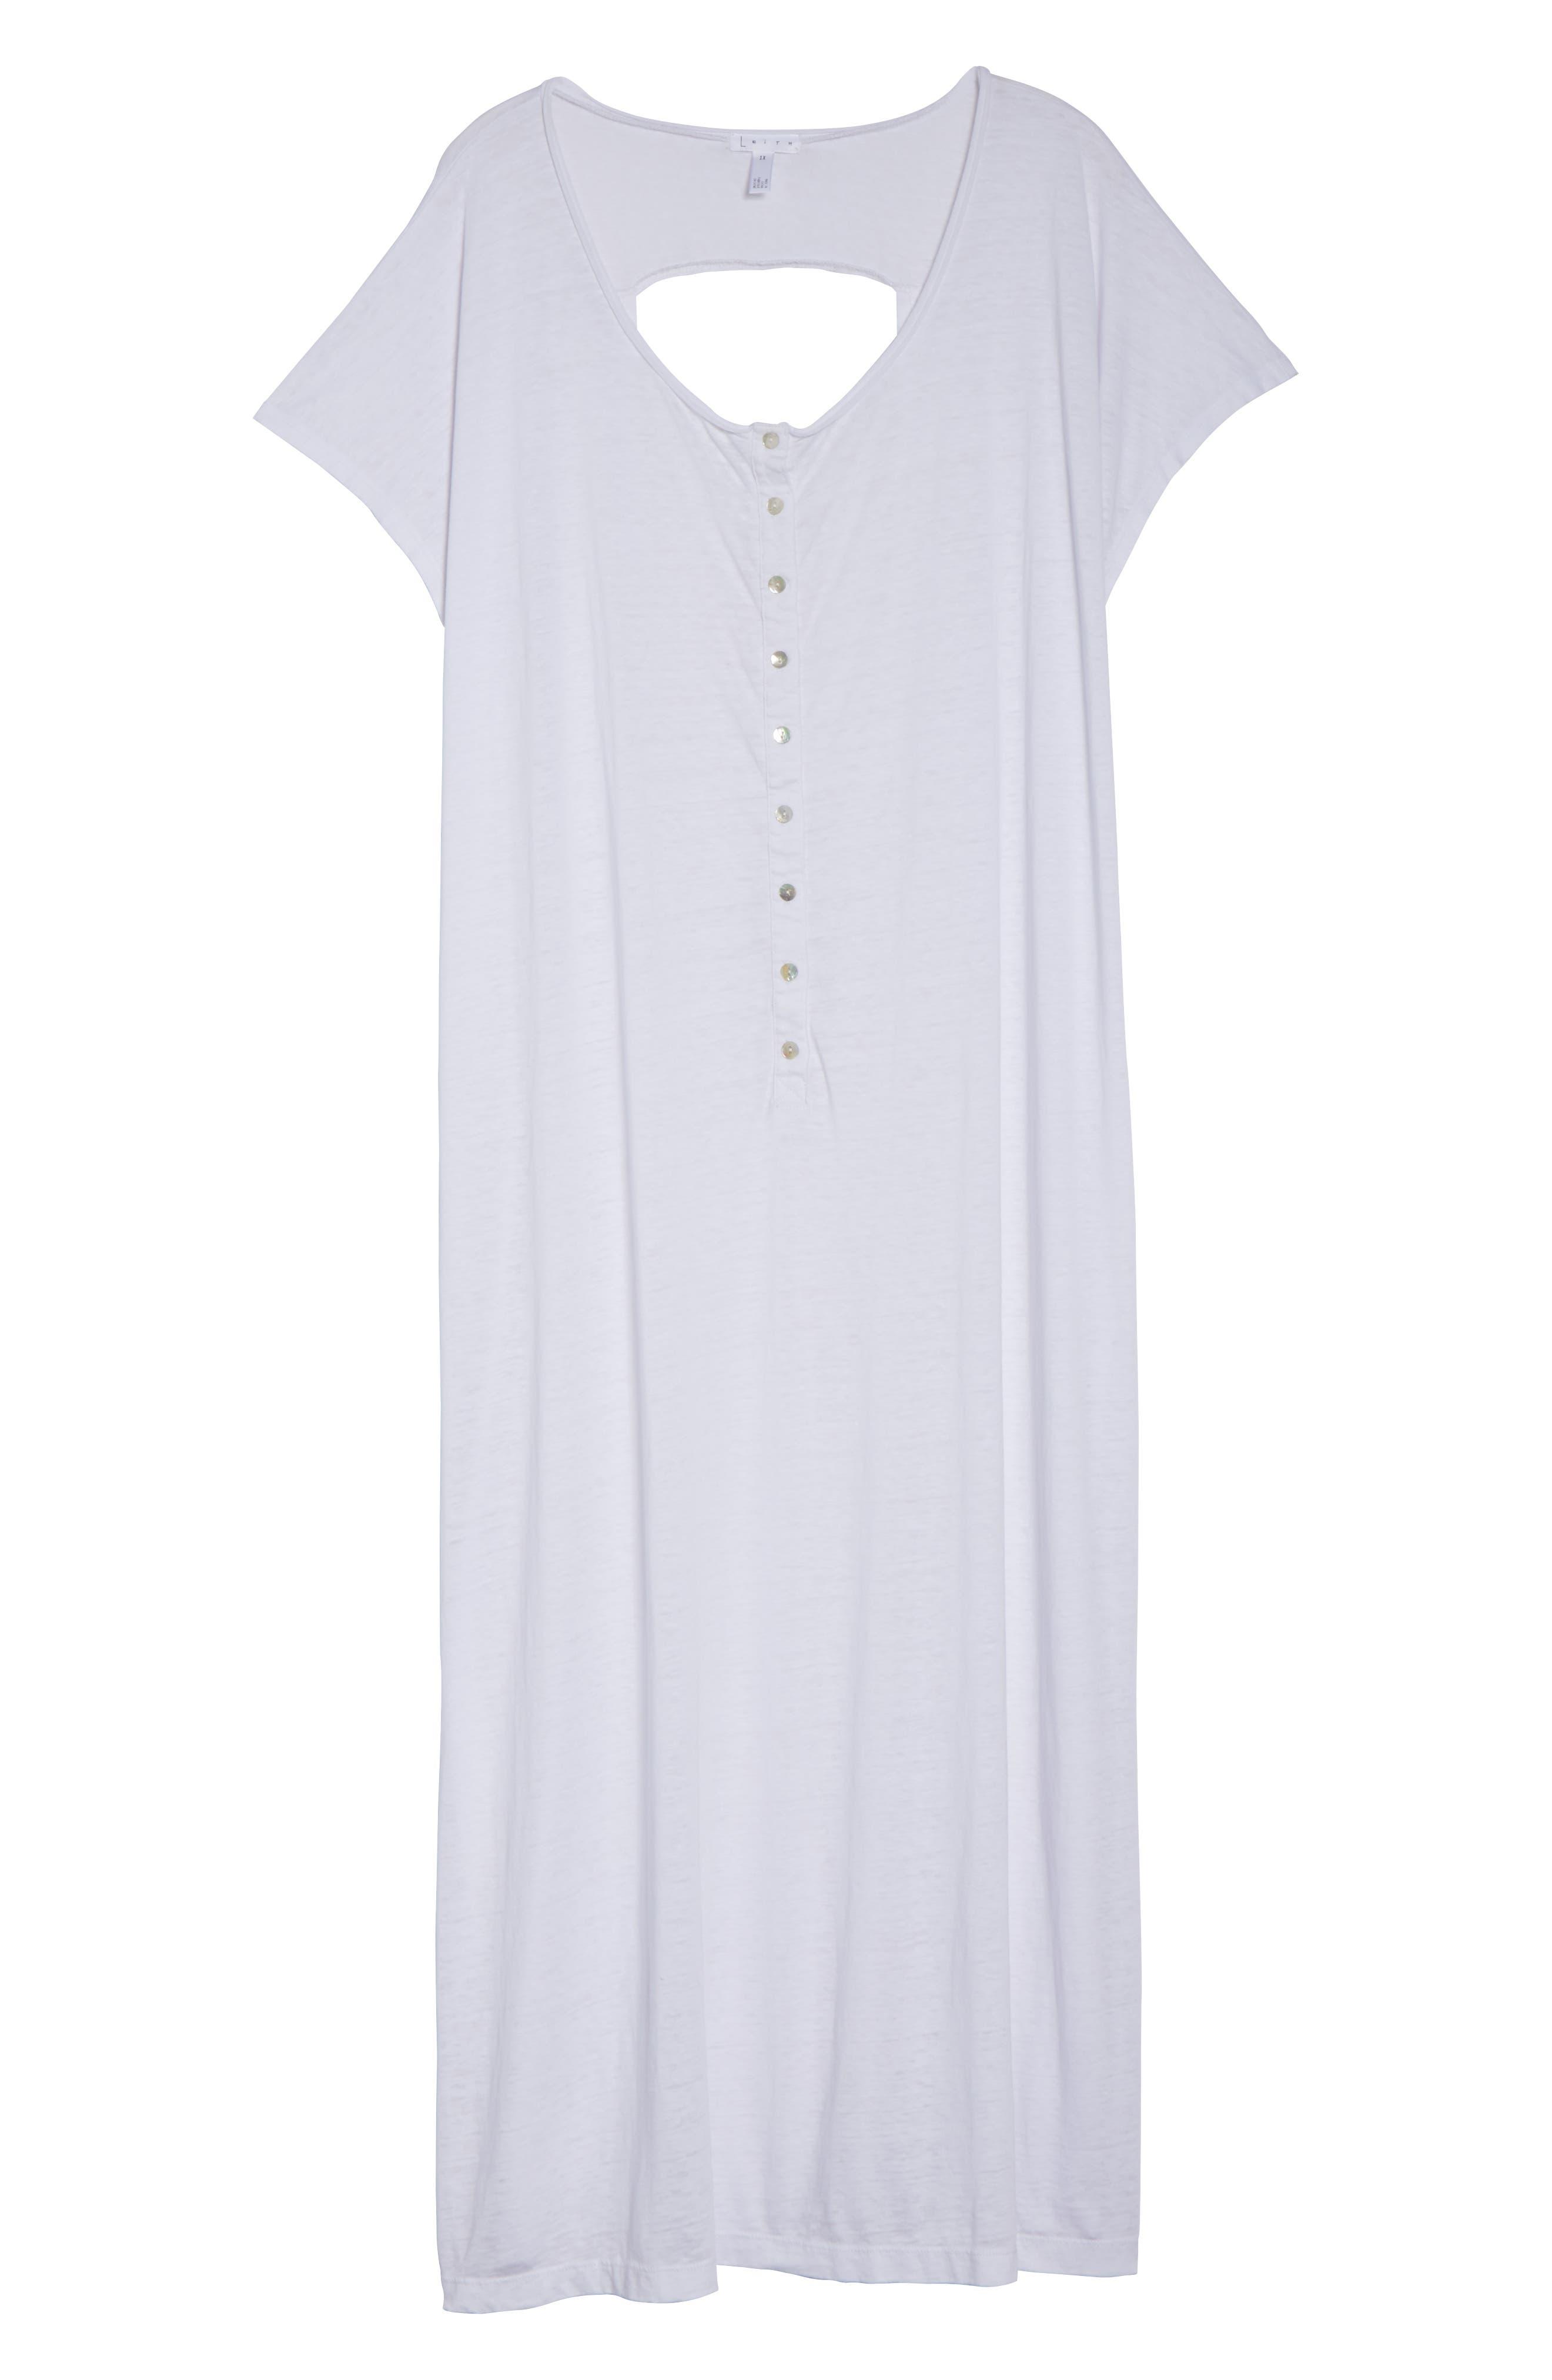 Henley Cover-Up Dress,                             Alternate thumbnail 6, color,                             100